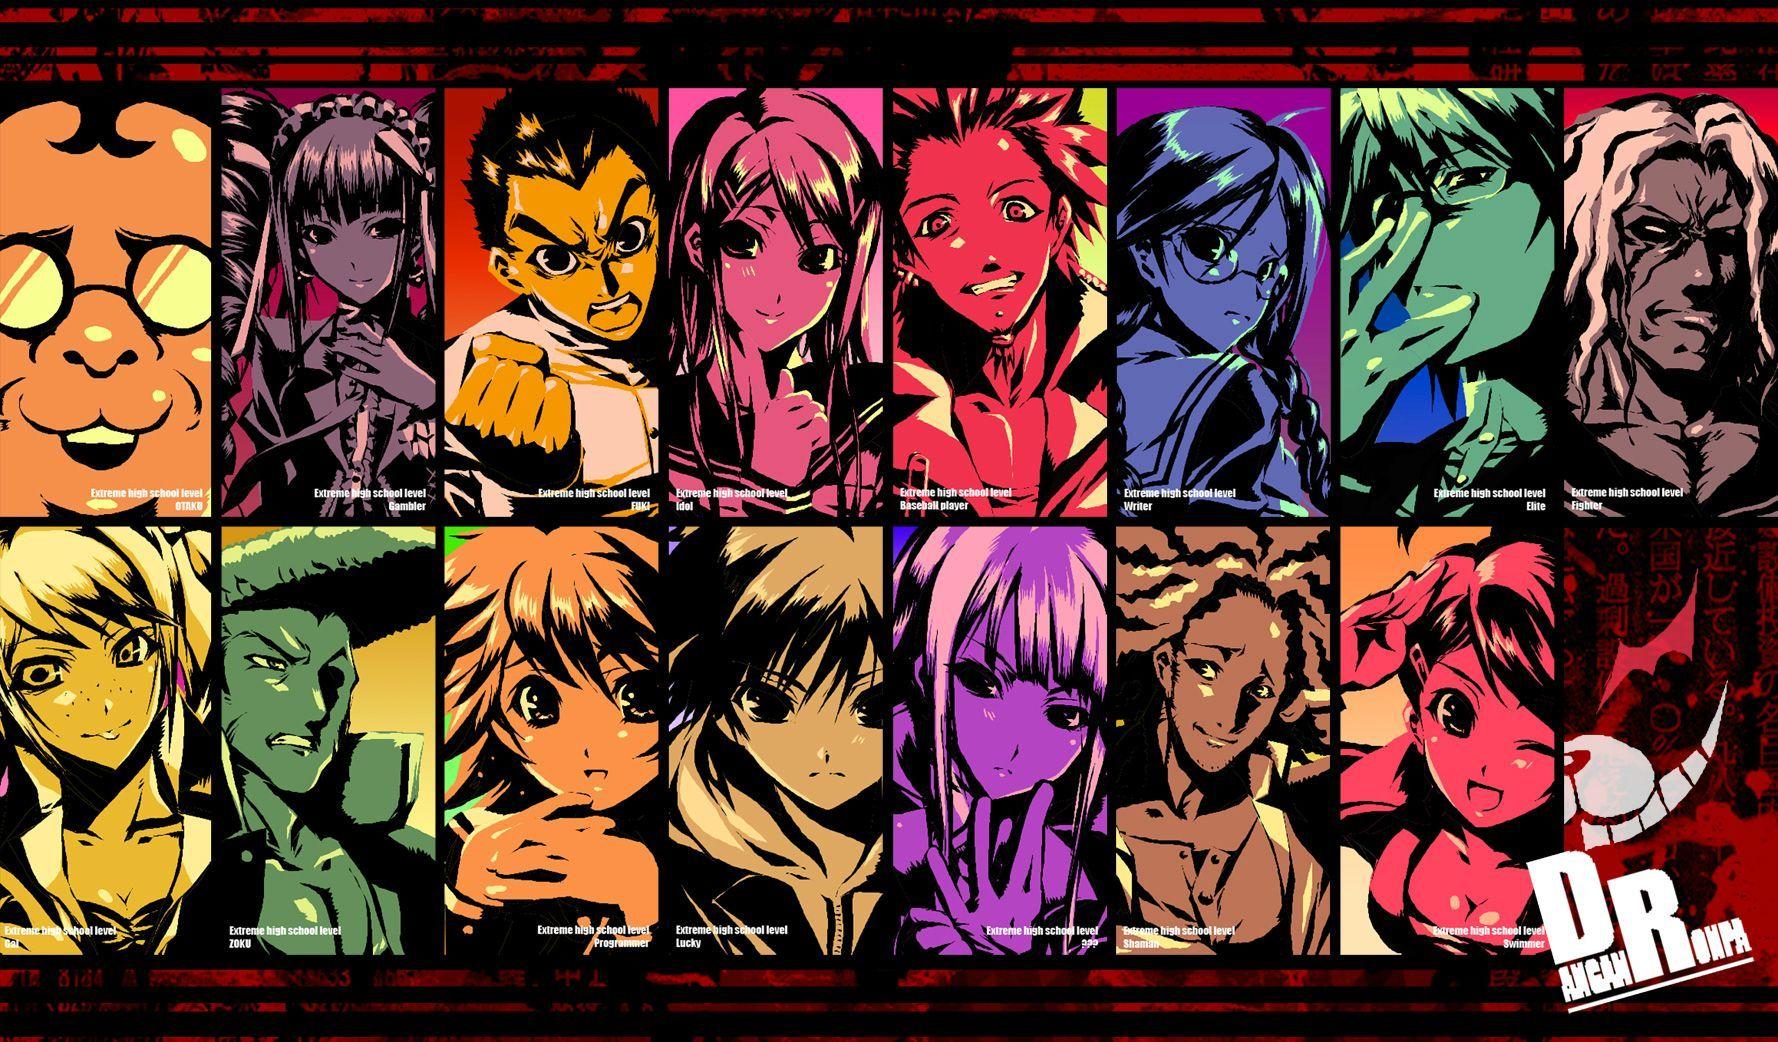 dangan ronpa Danganronpa, Danganronpa game, Anime